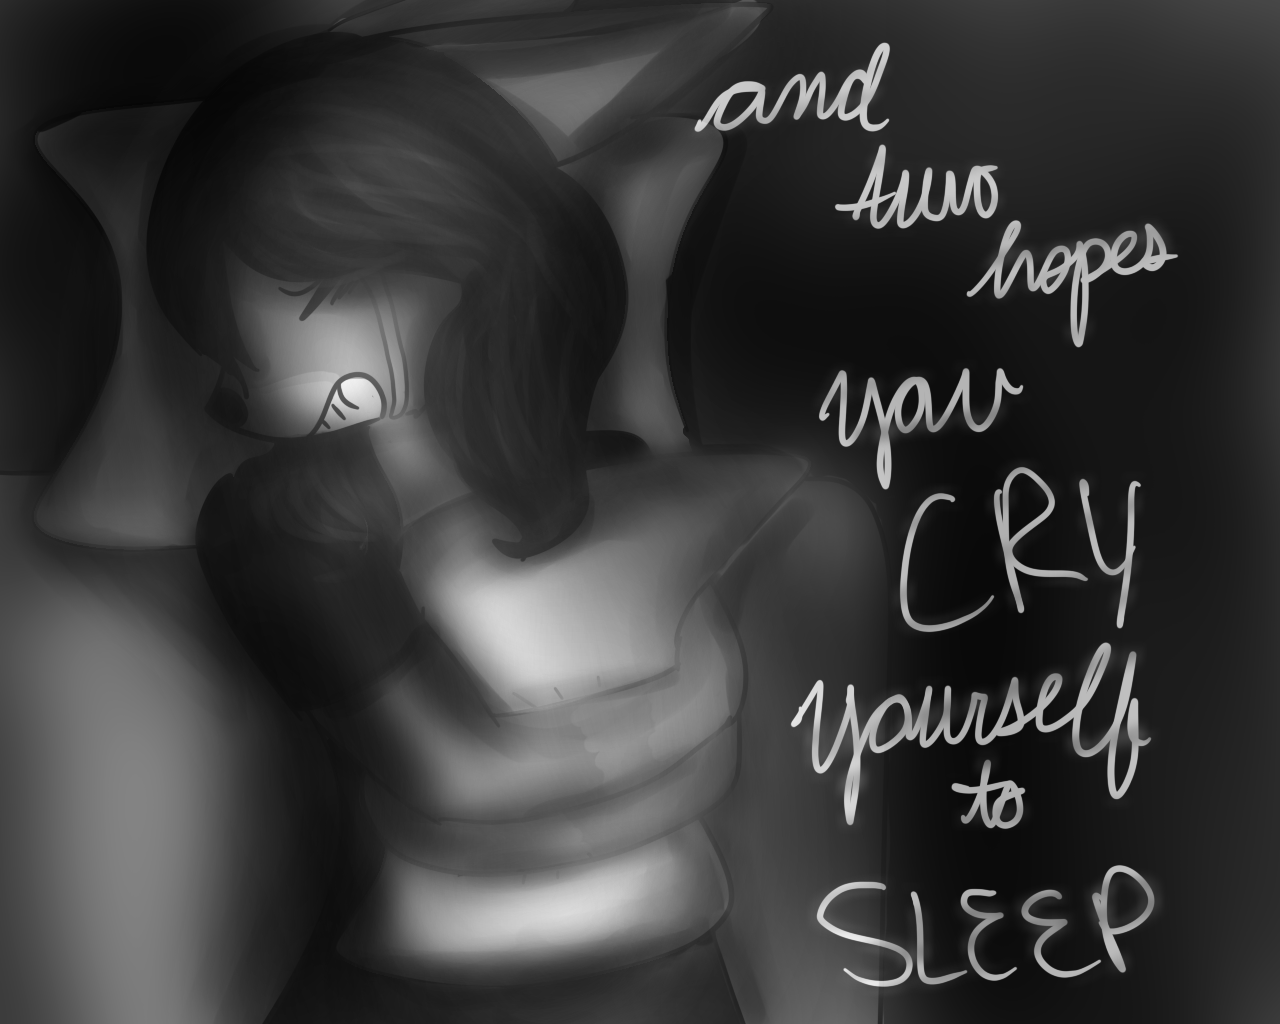 how to cry yourself to sleep wikihow